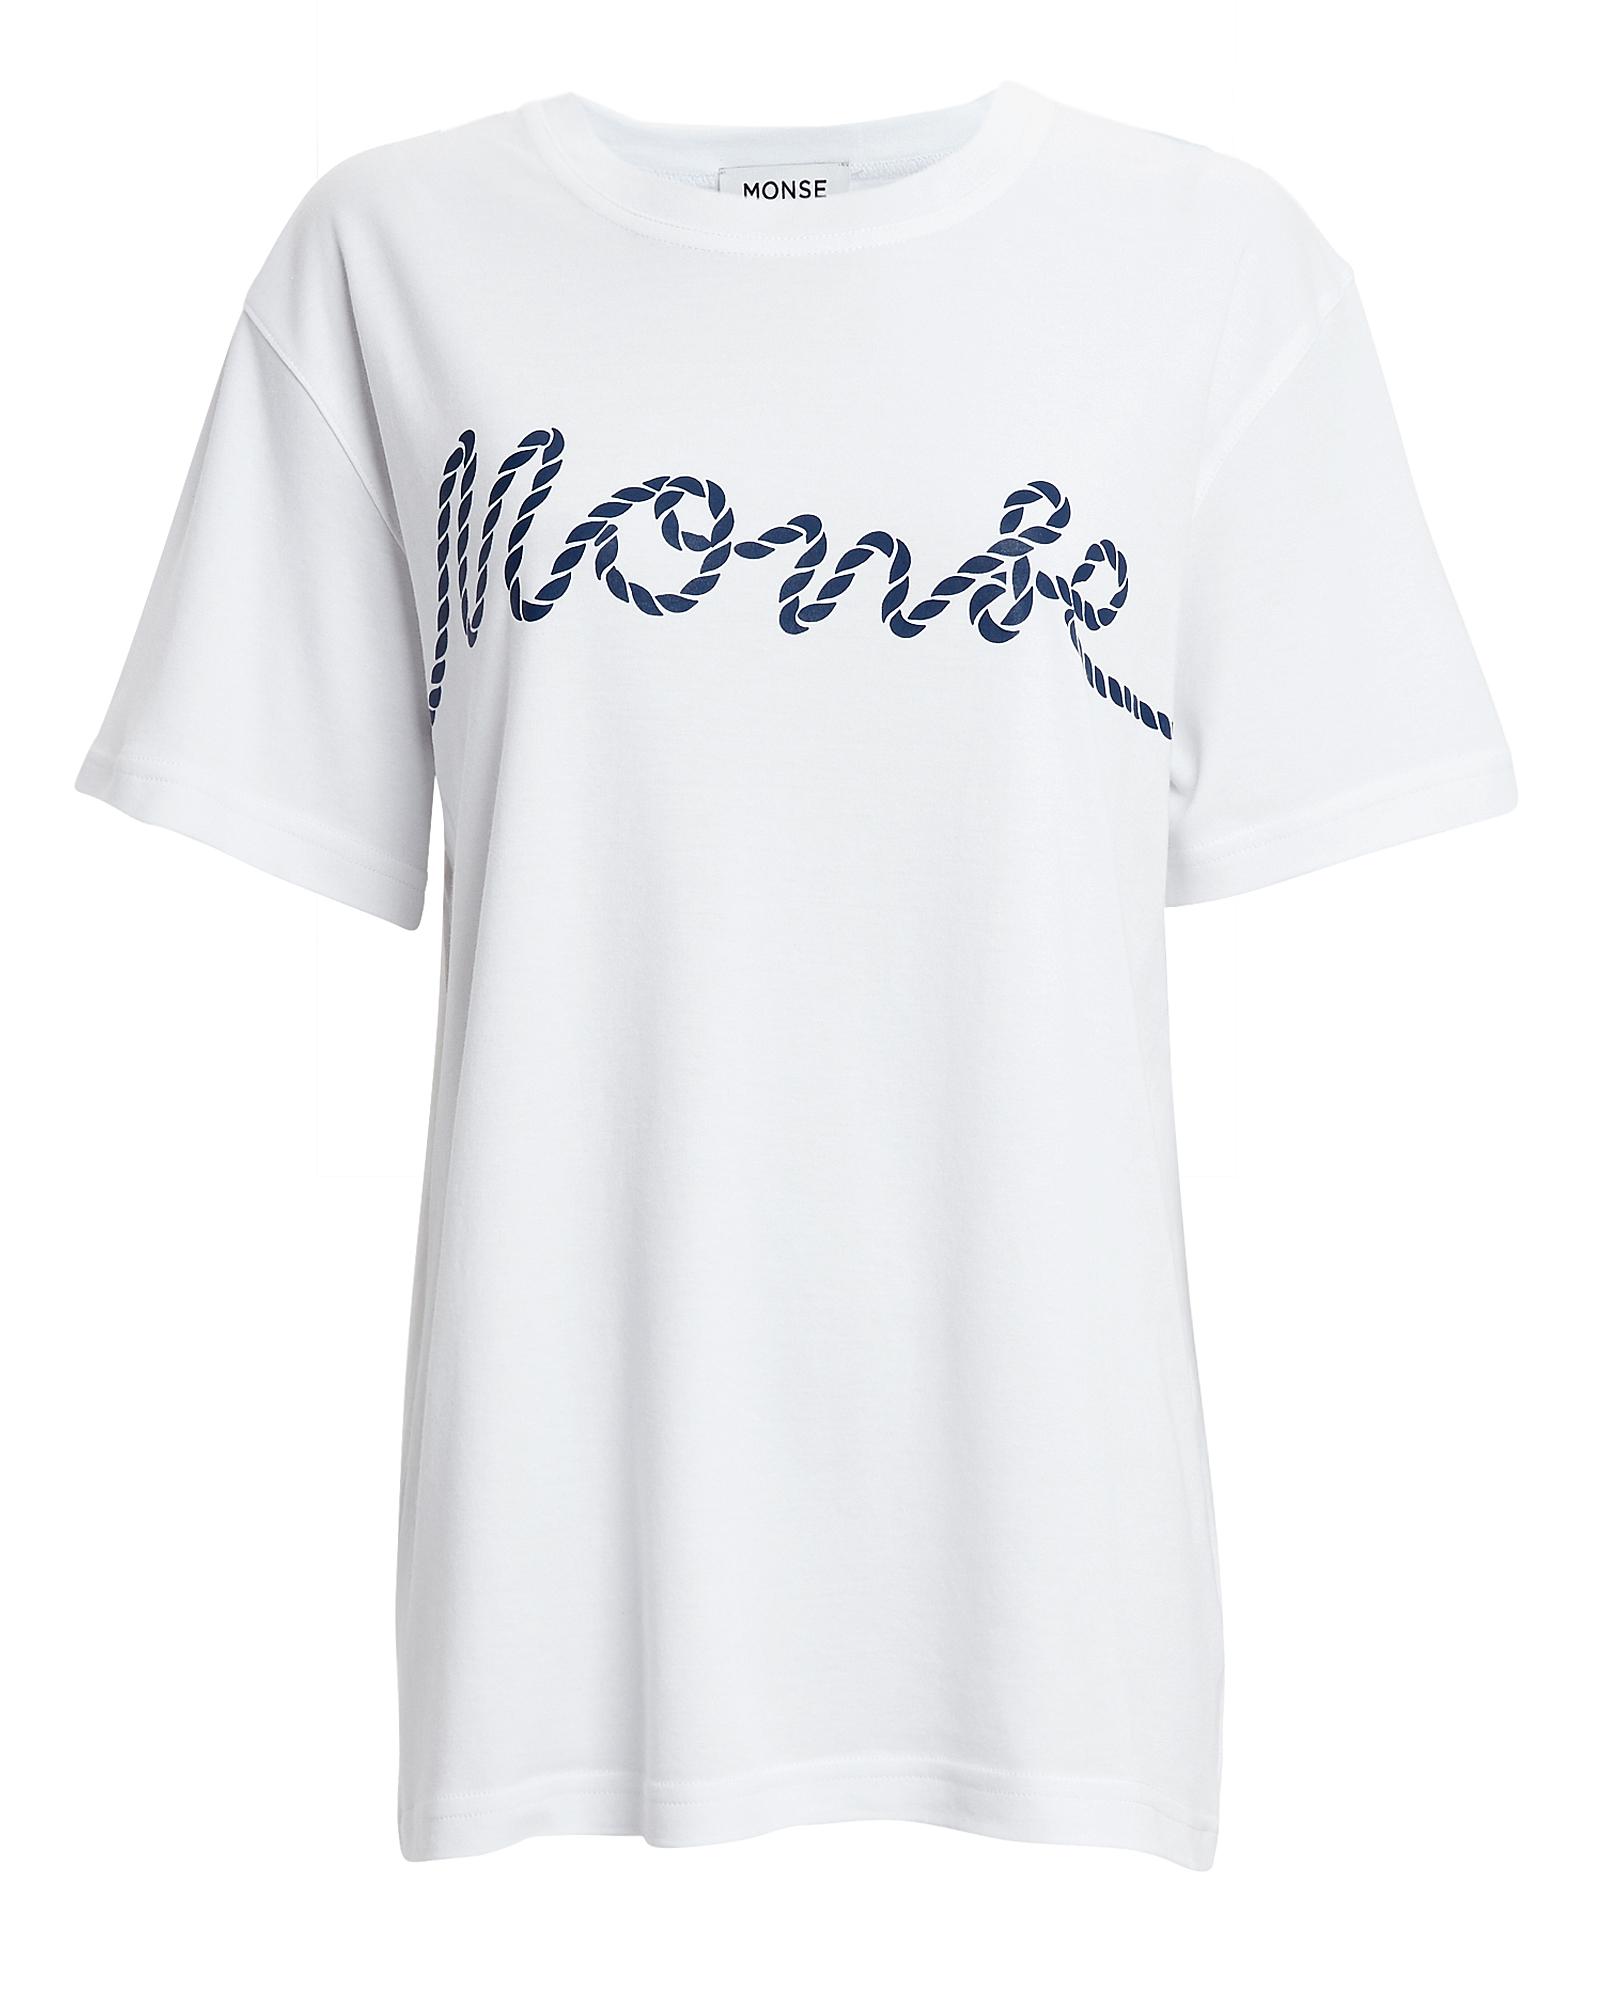 Rope Print T Shirt by Monse